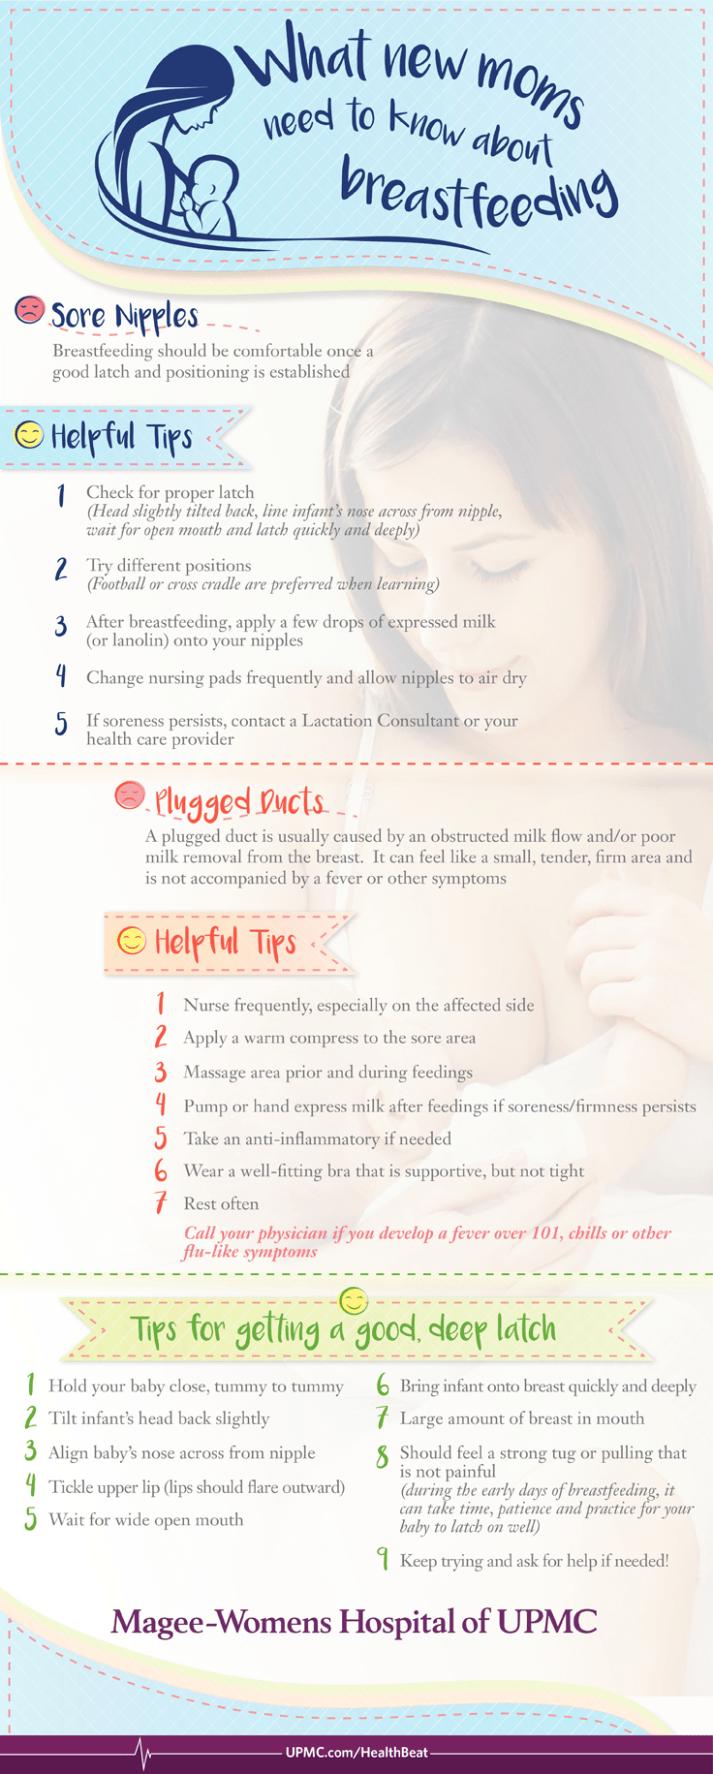 49 27 Helpful Charts For Breastfeeding Moms Loveliliya Baby